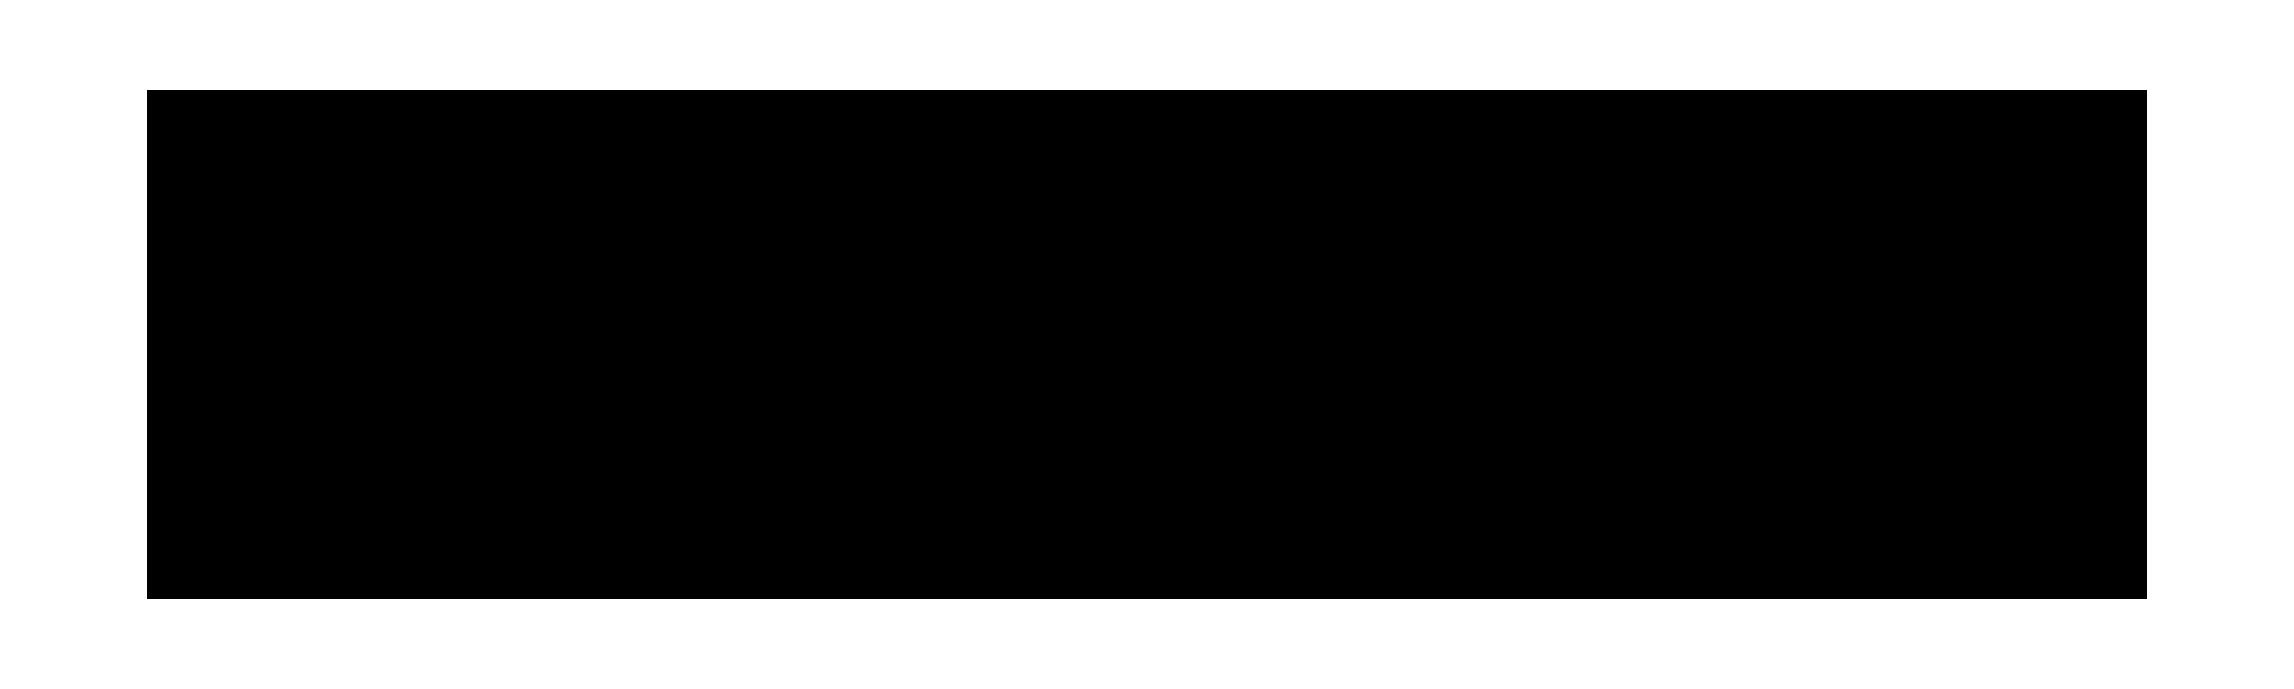 HS Logo - 2019 - Black - Horizontal - RGB.png